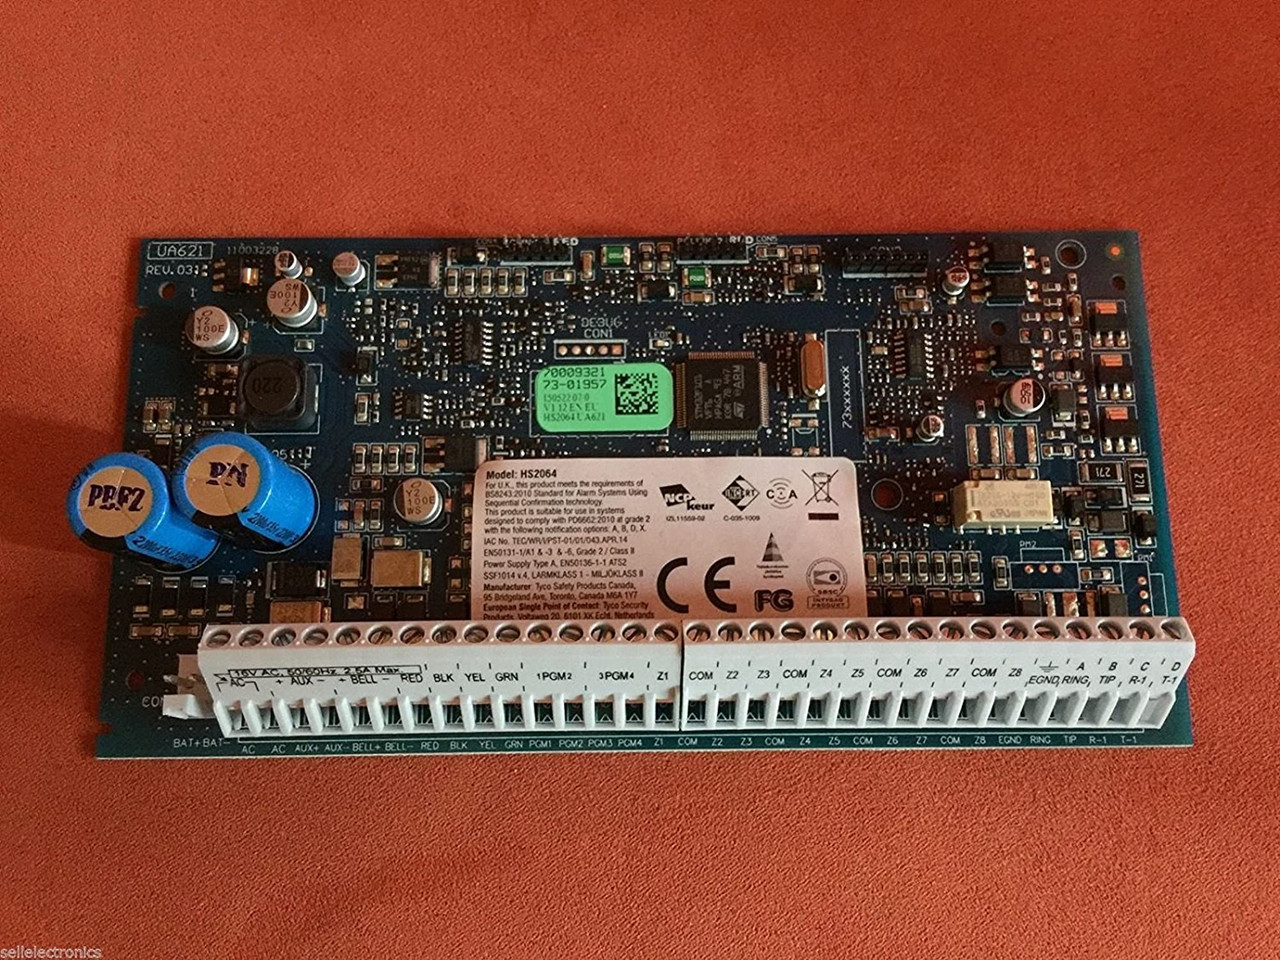 DSC Power Series HSM2204 Power Supply Module NEW IN BOX